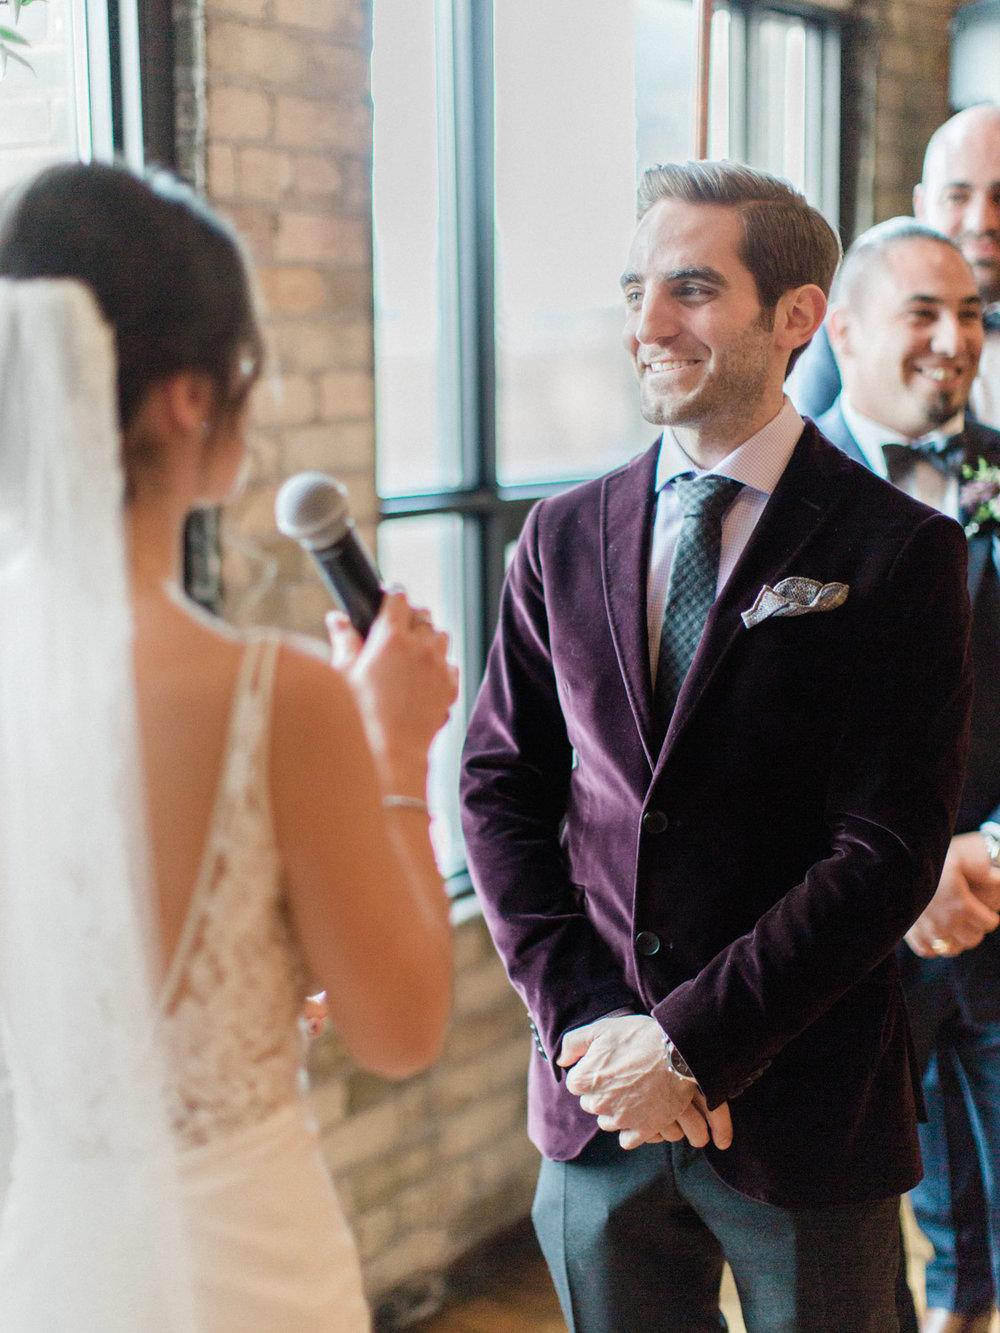 Toronto-wedding-photographer-intimate-italian-the-burroughes-downtown91.jpg